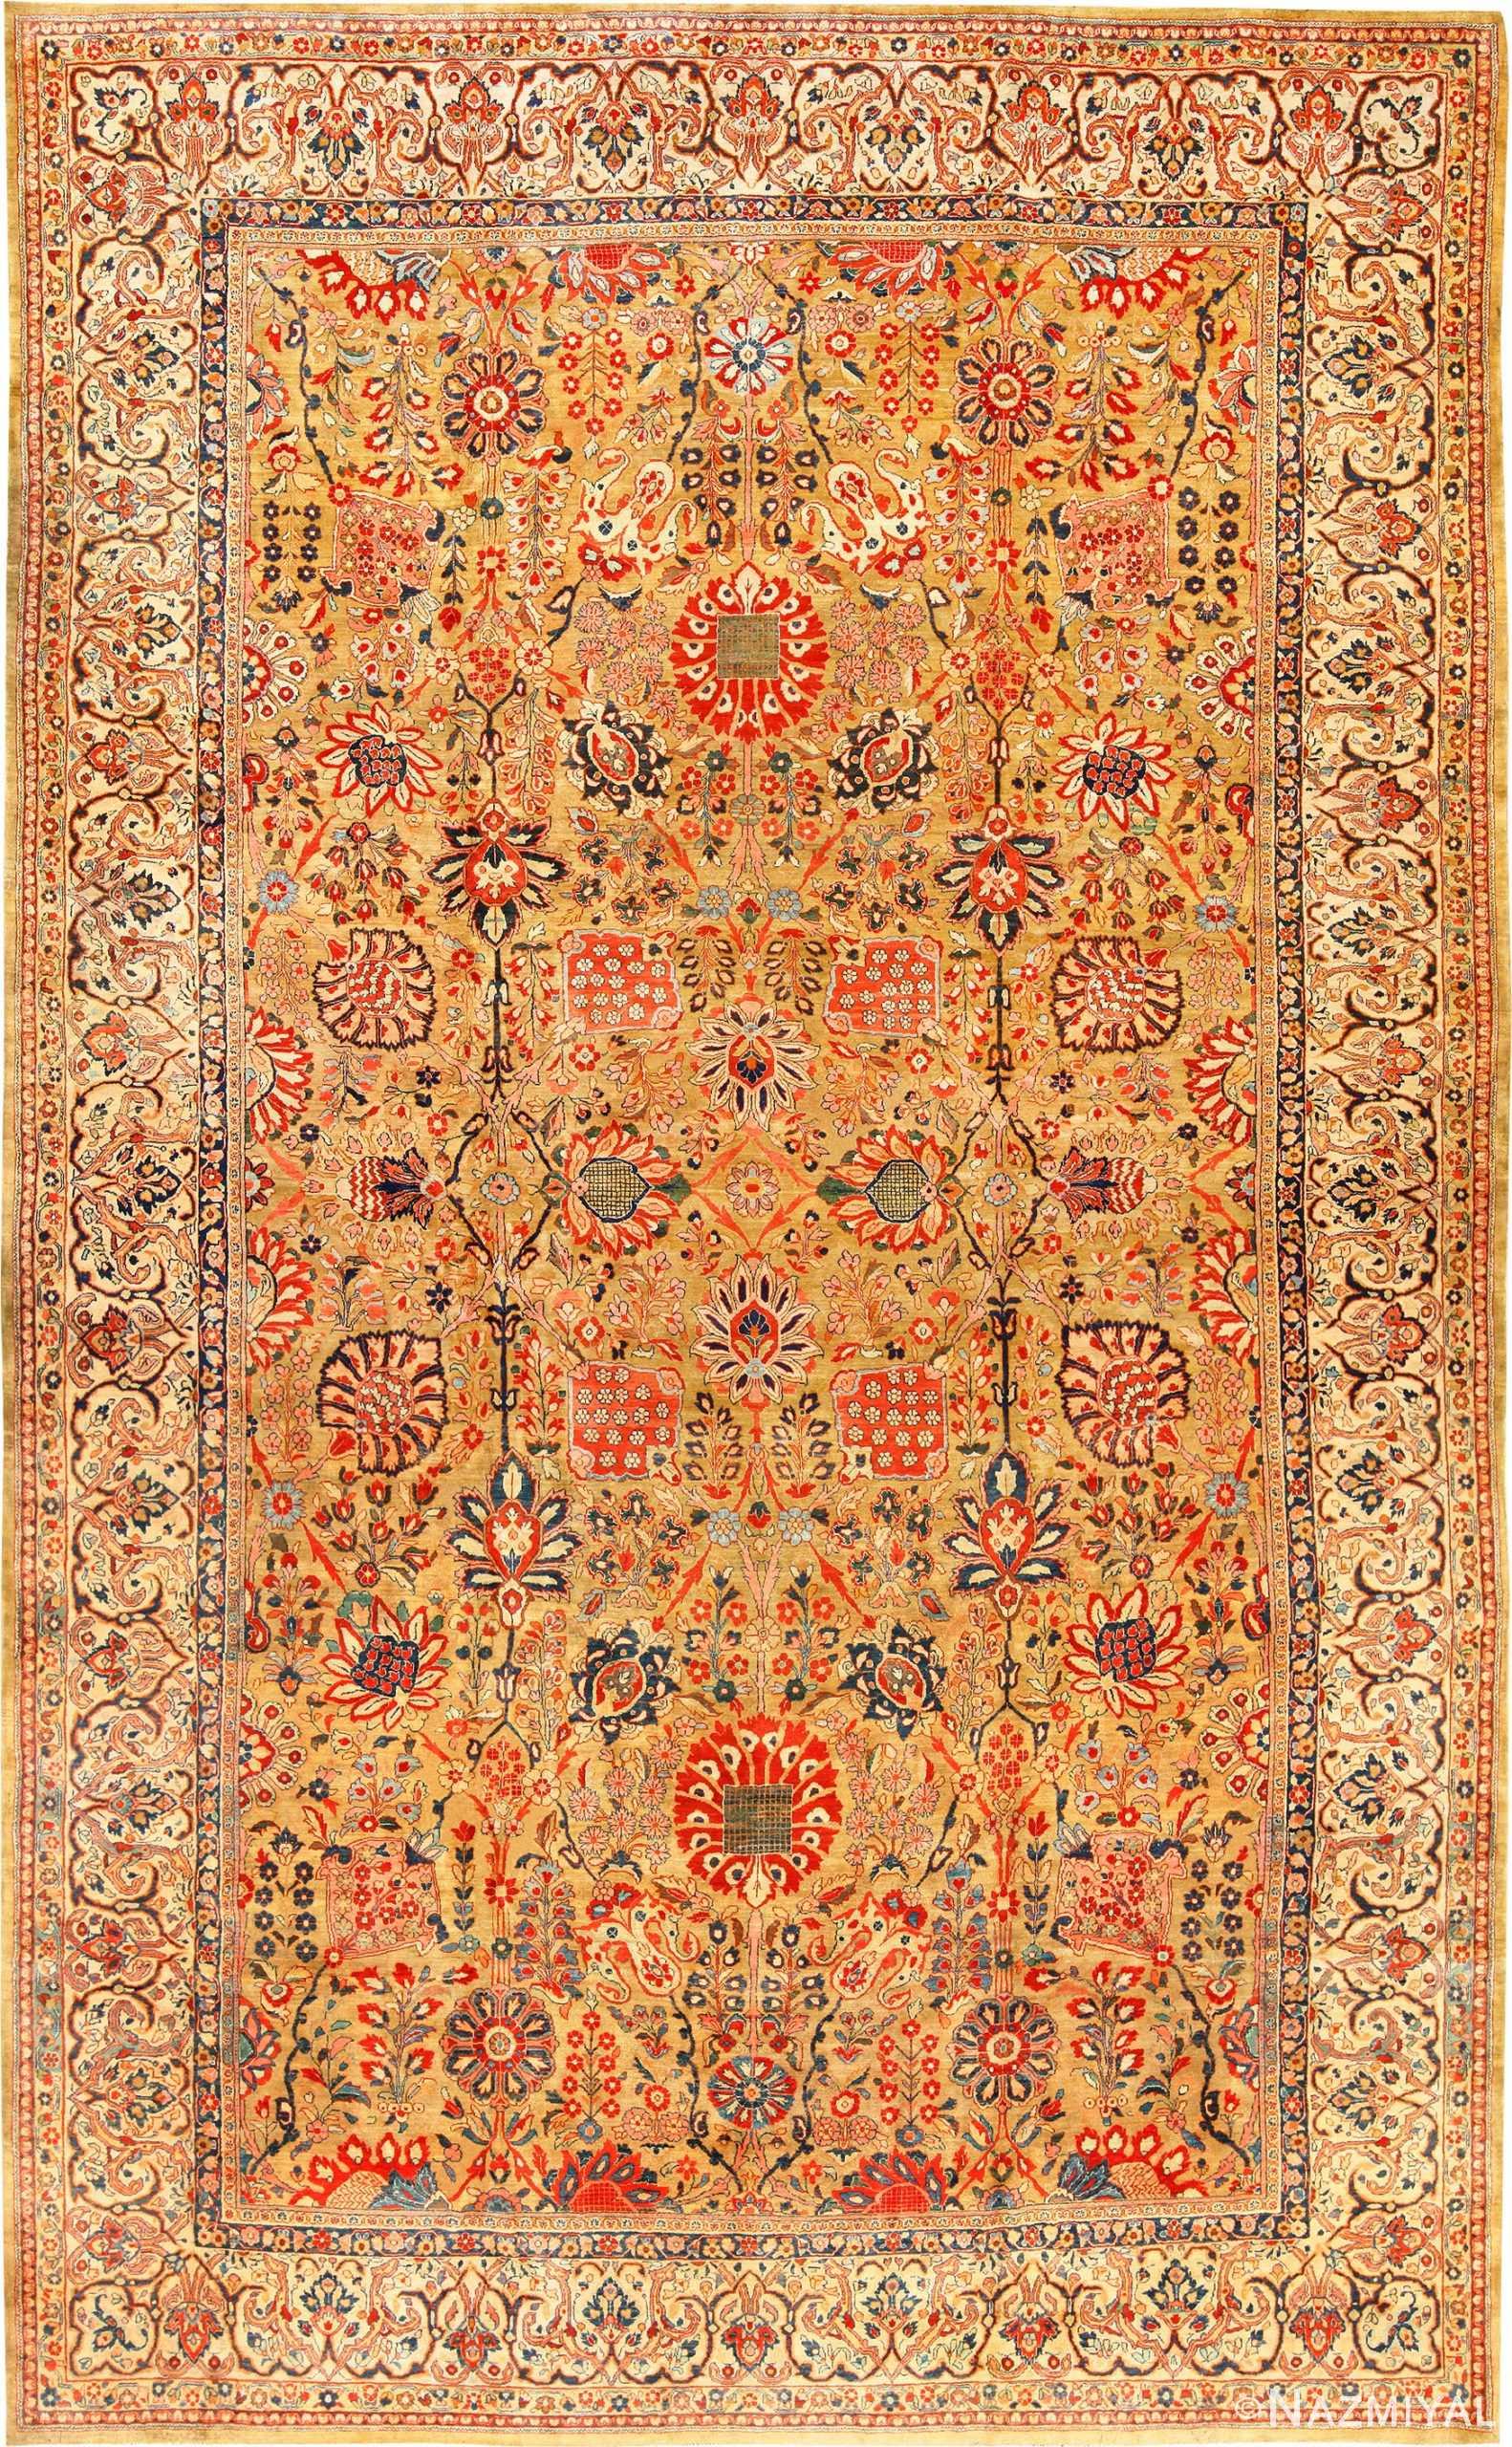 Large Scale Gold Background Vase Design Antique Persian Sarouk Rug 49169 Nazmiyal